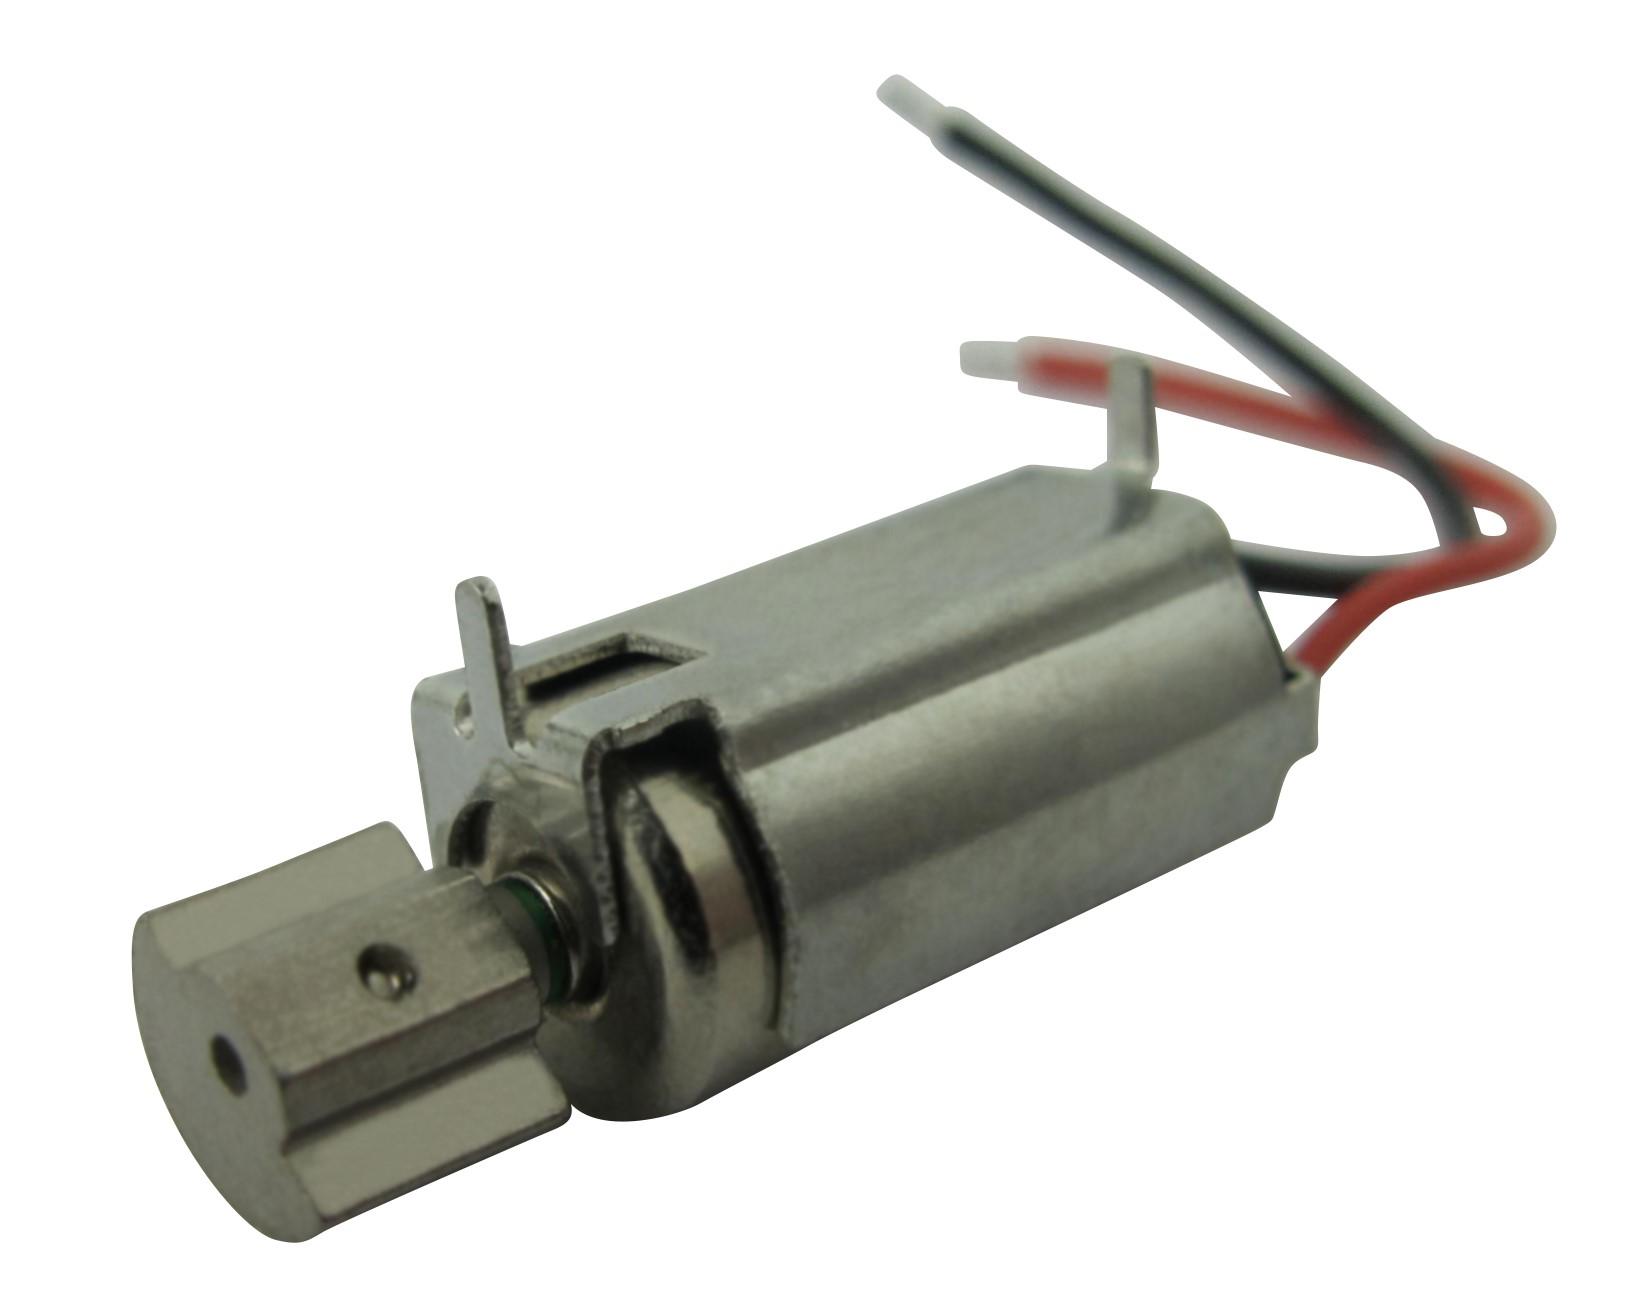 Z6DL2A0050441 Cylindrical Vibrator Motor